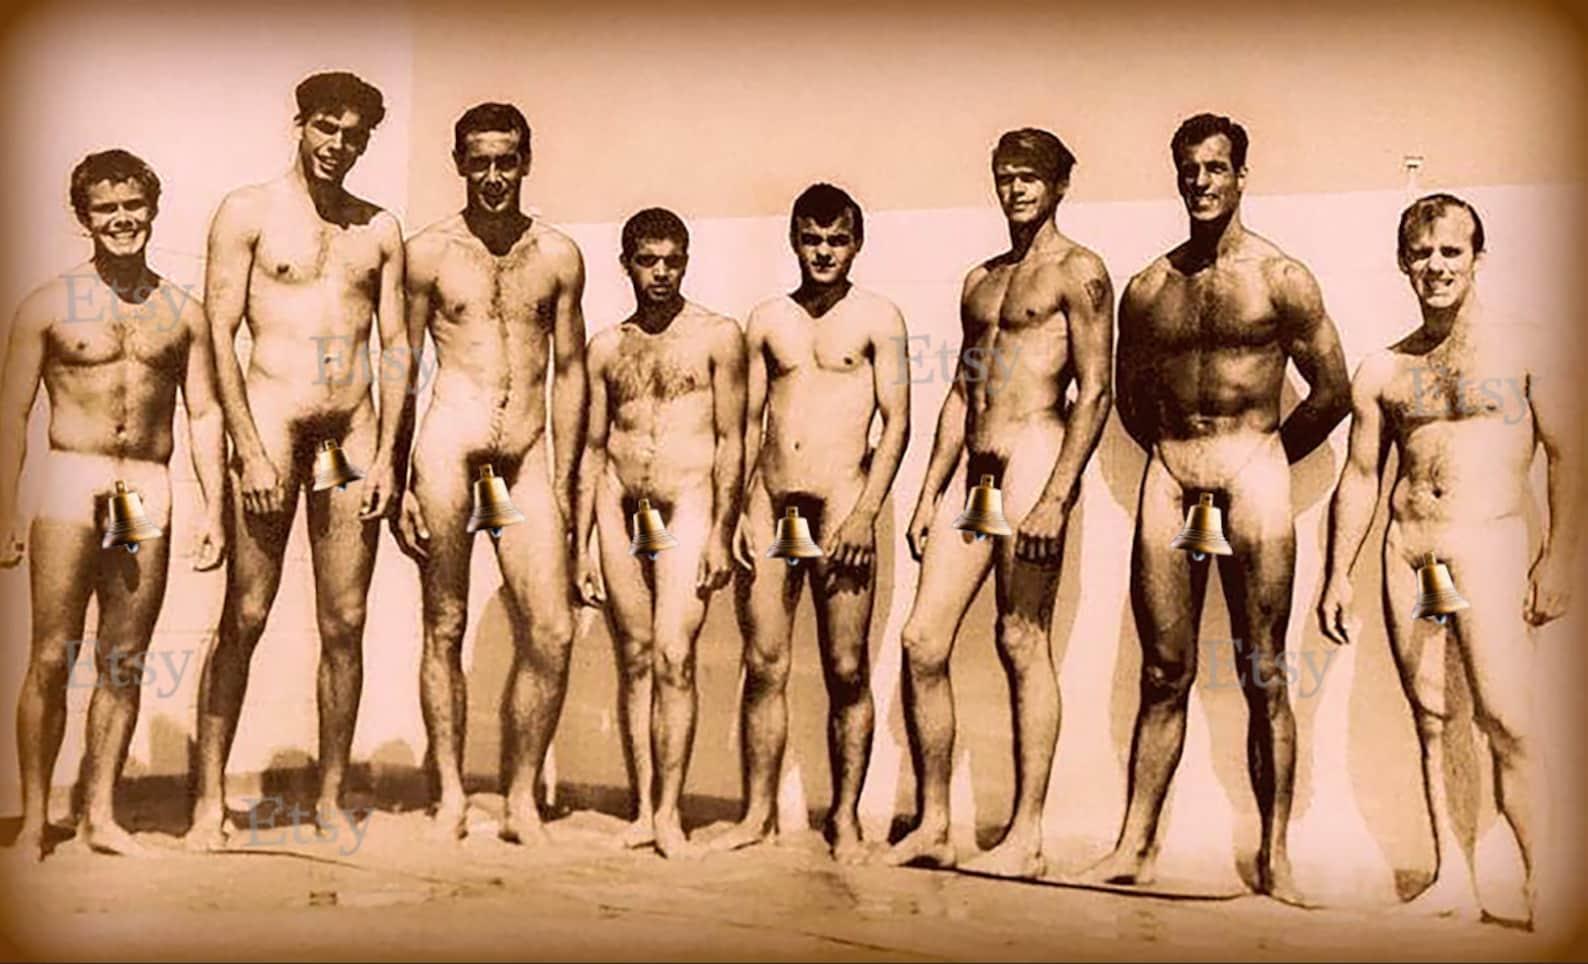 Vintage nude men nature